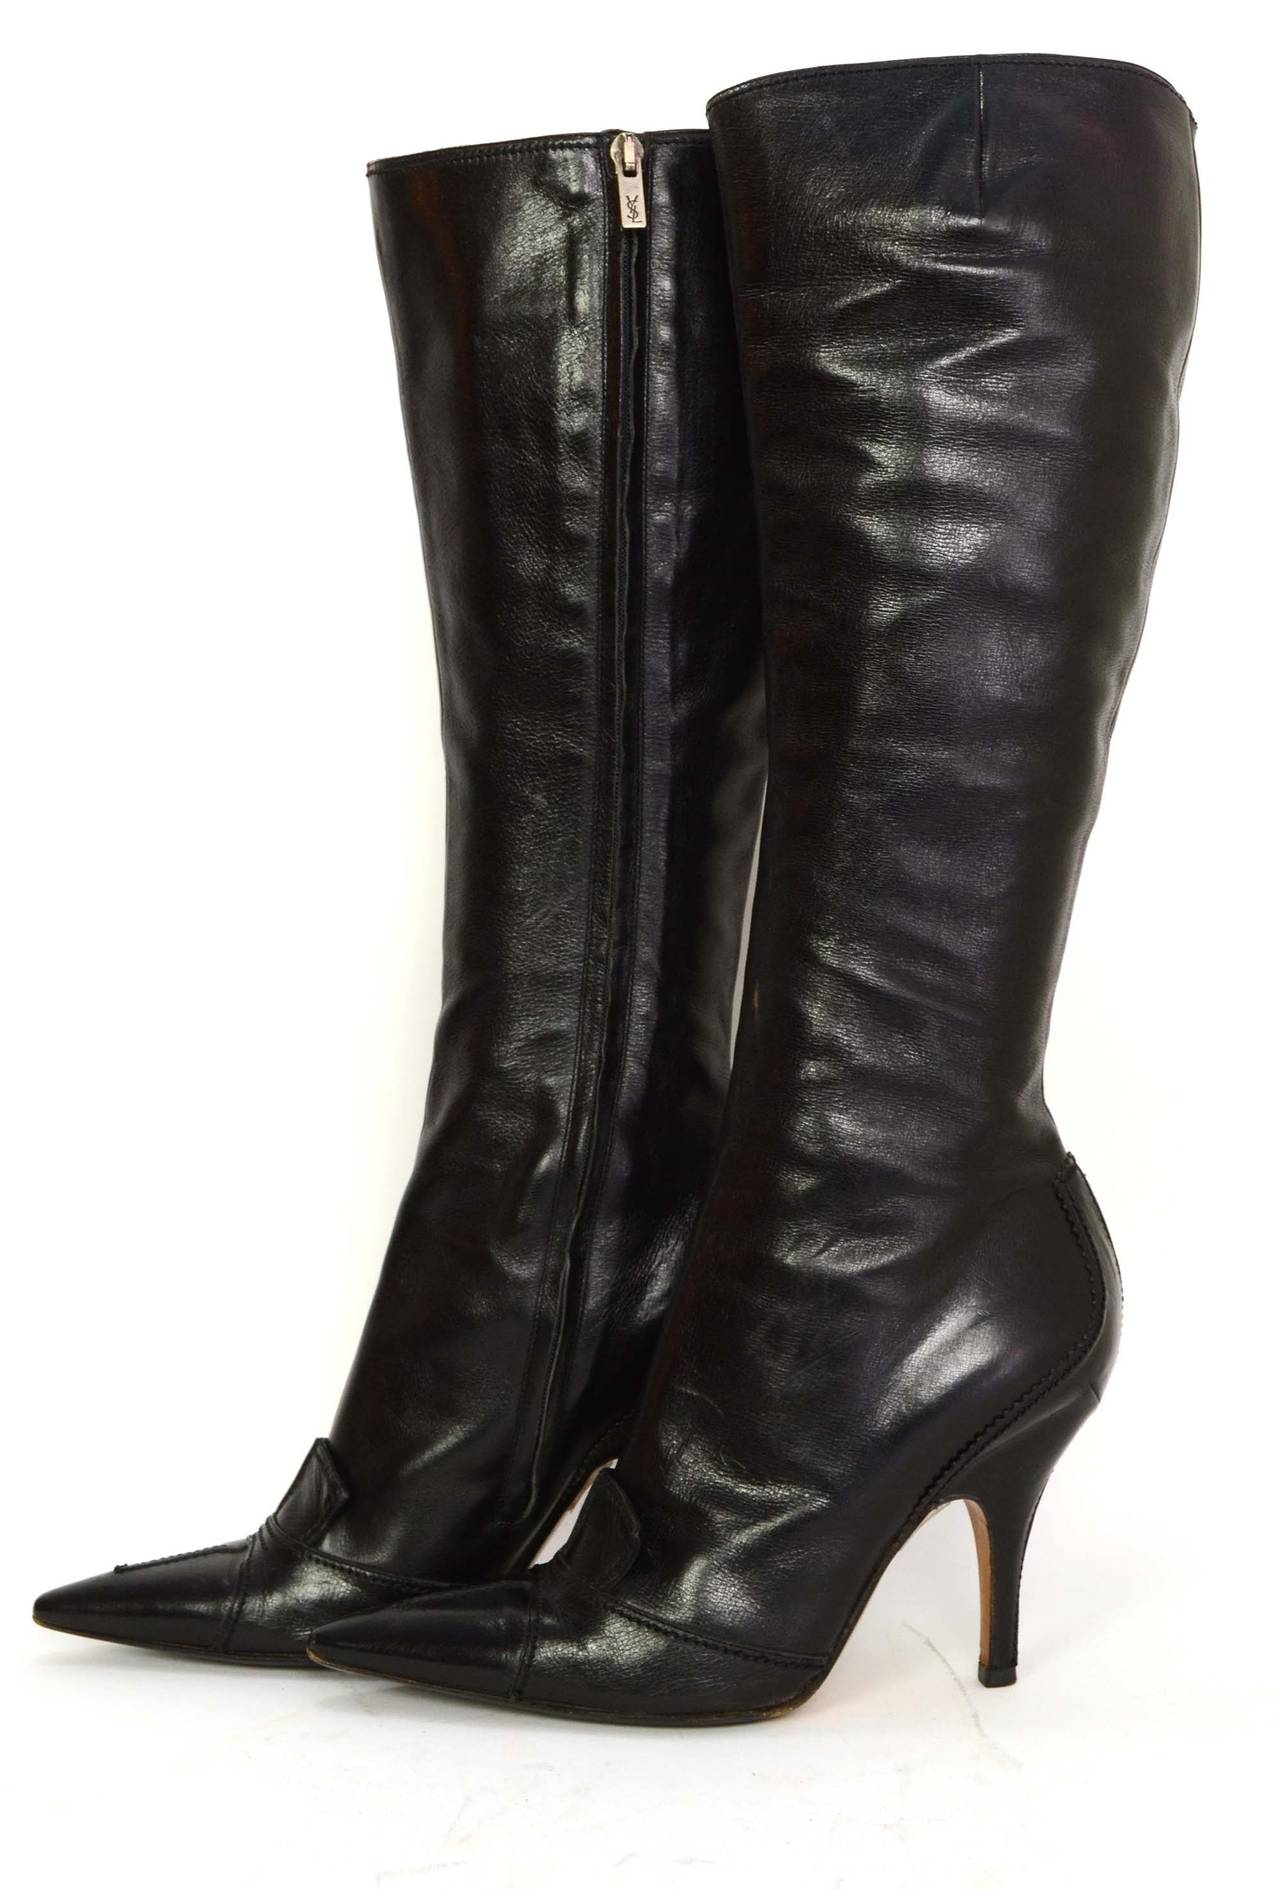 YVES SAINT LAURENT YSL Black Leather Tall Boots sz 37.5 3